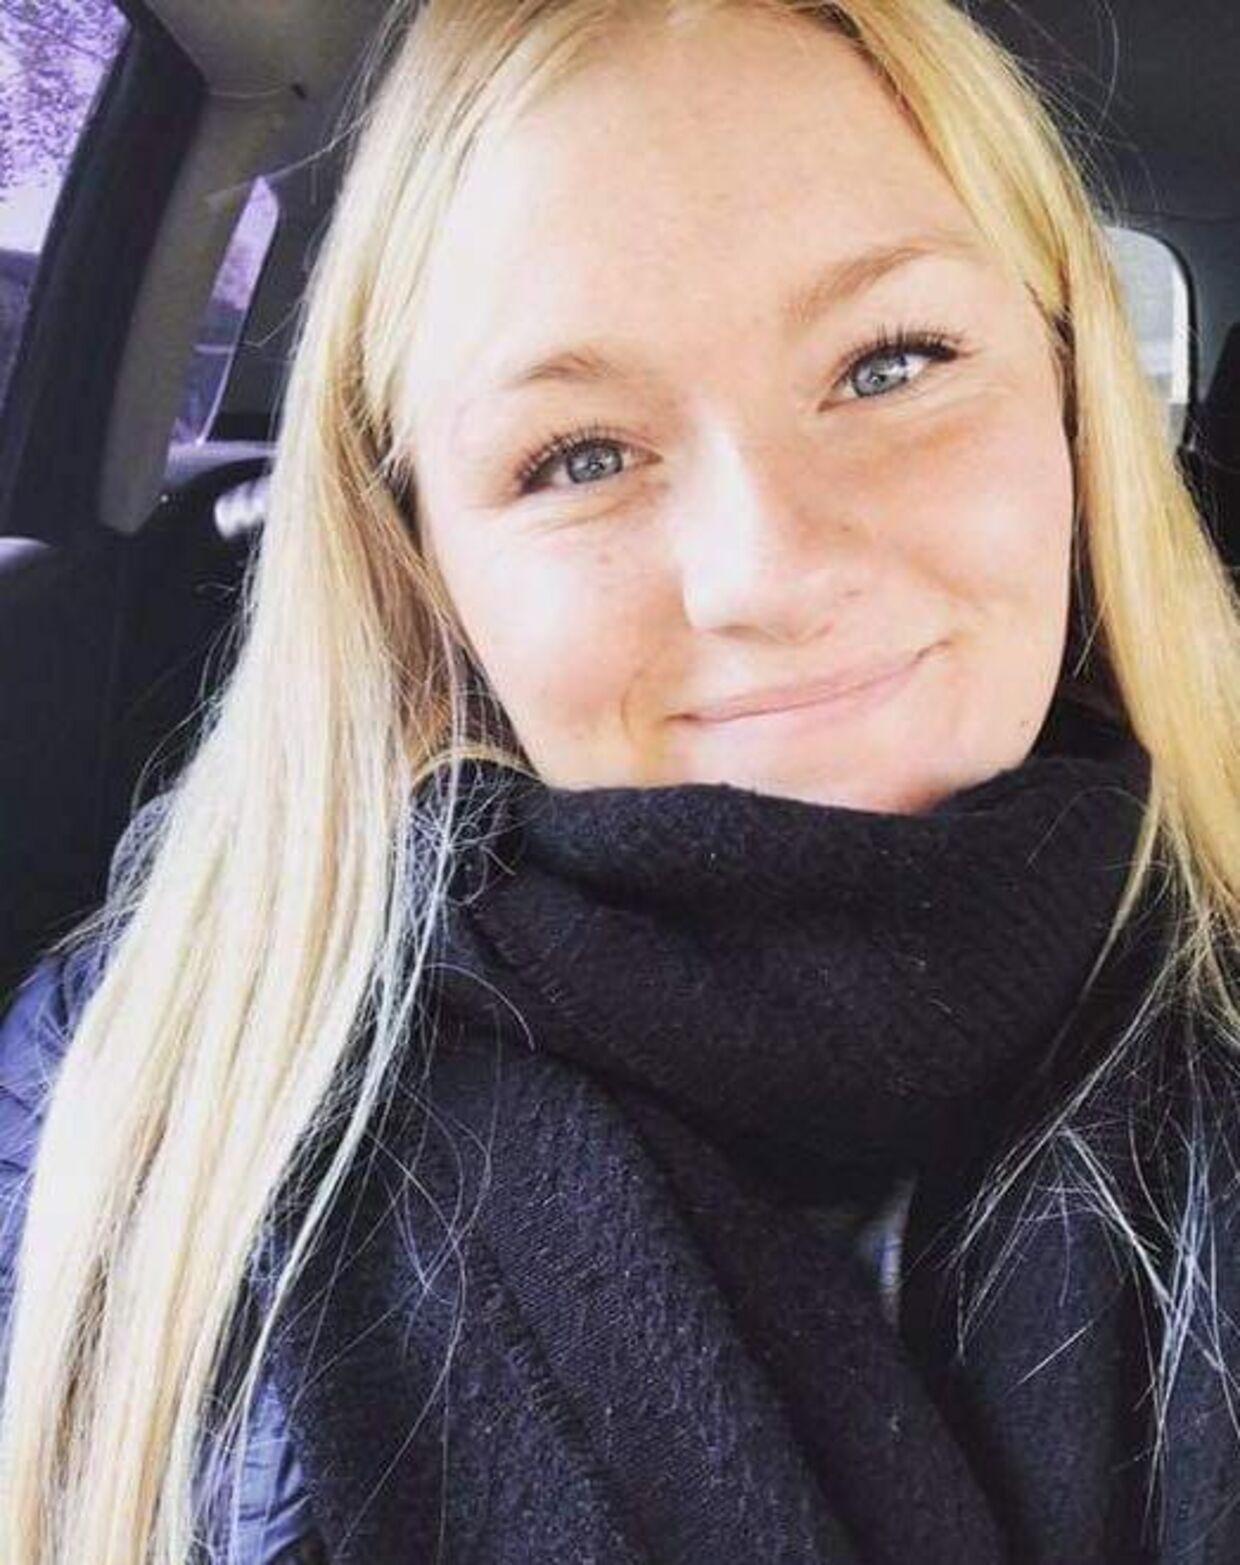 Gita Blak Rasmussen ventede forgæves på en julegave købt hos Photobox.